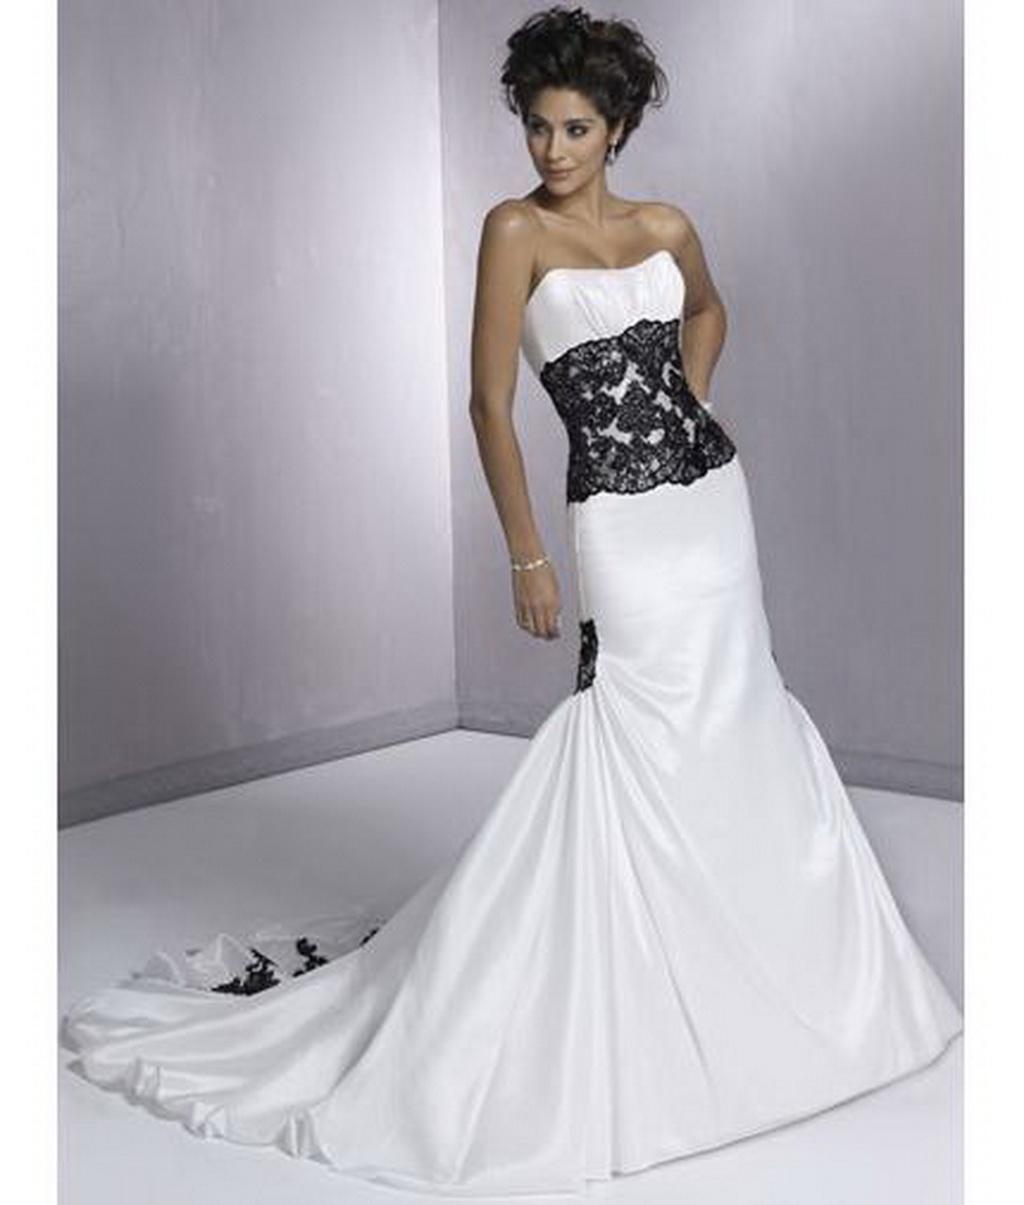 Black And White Wedding Dresses For  : Wedding photos black couples